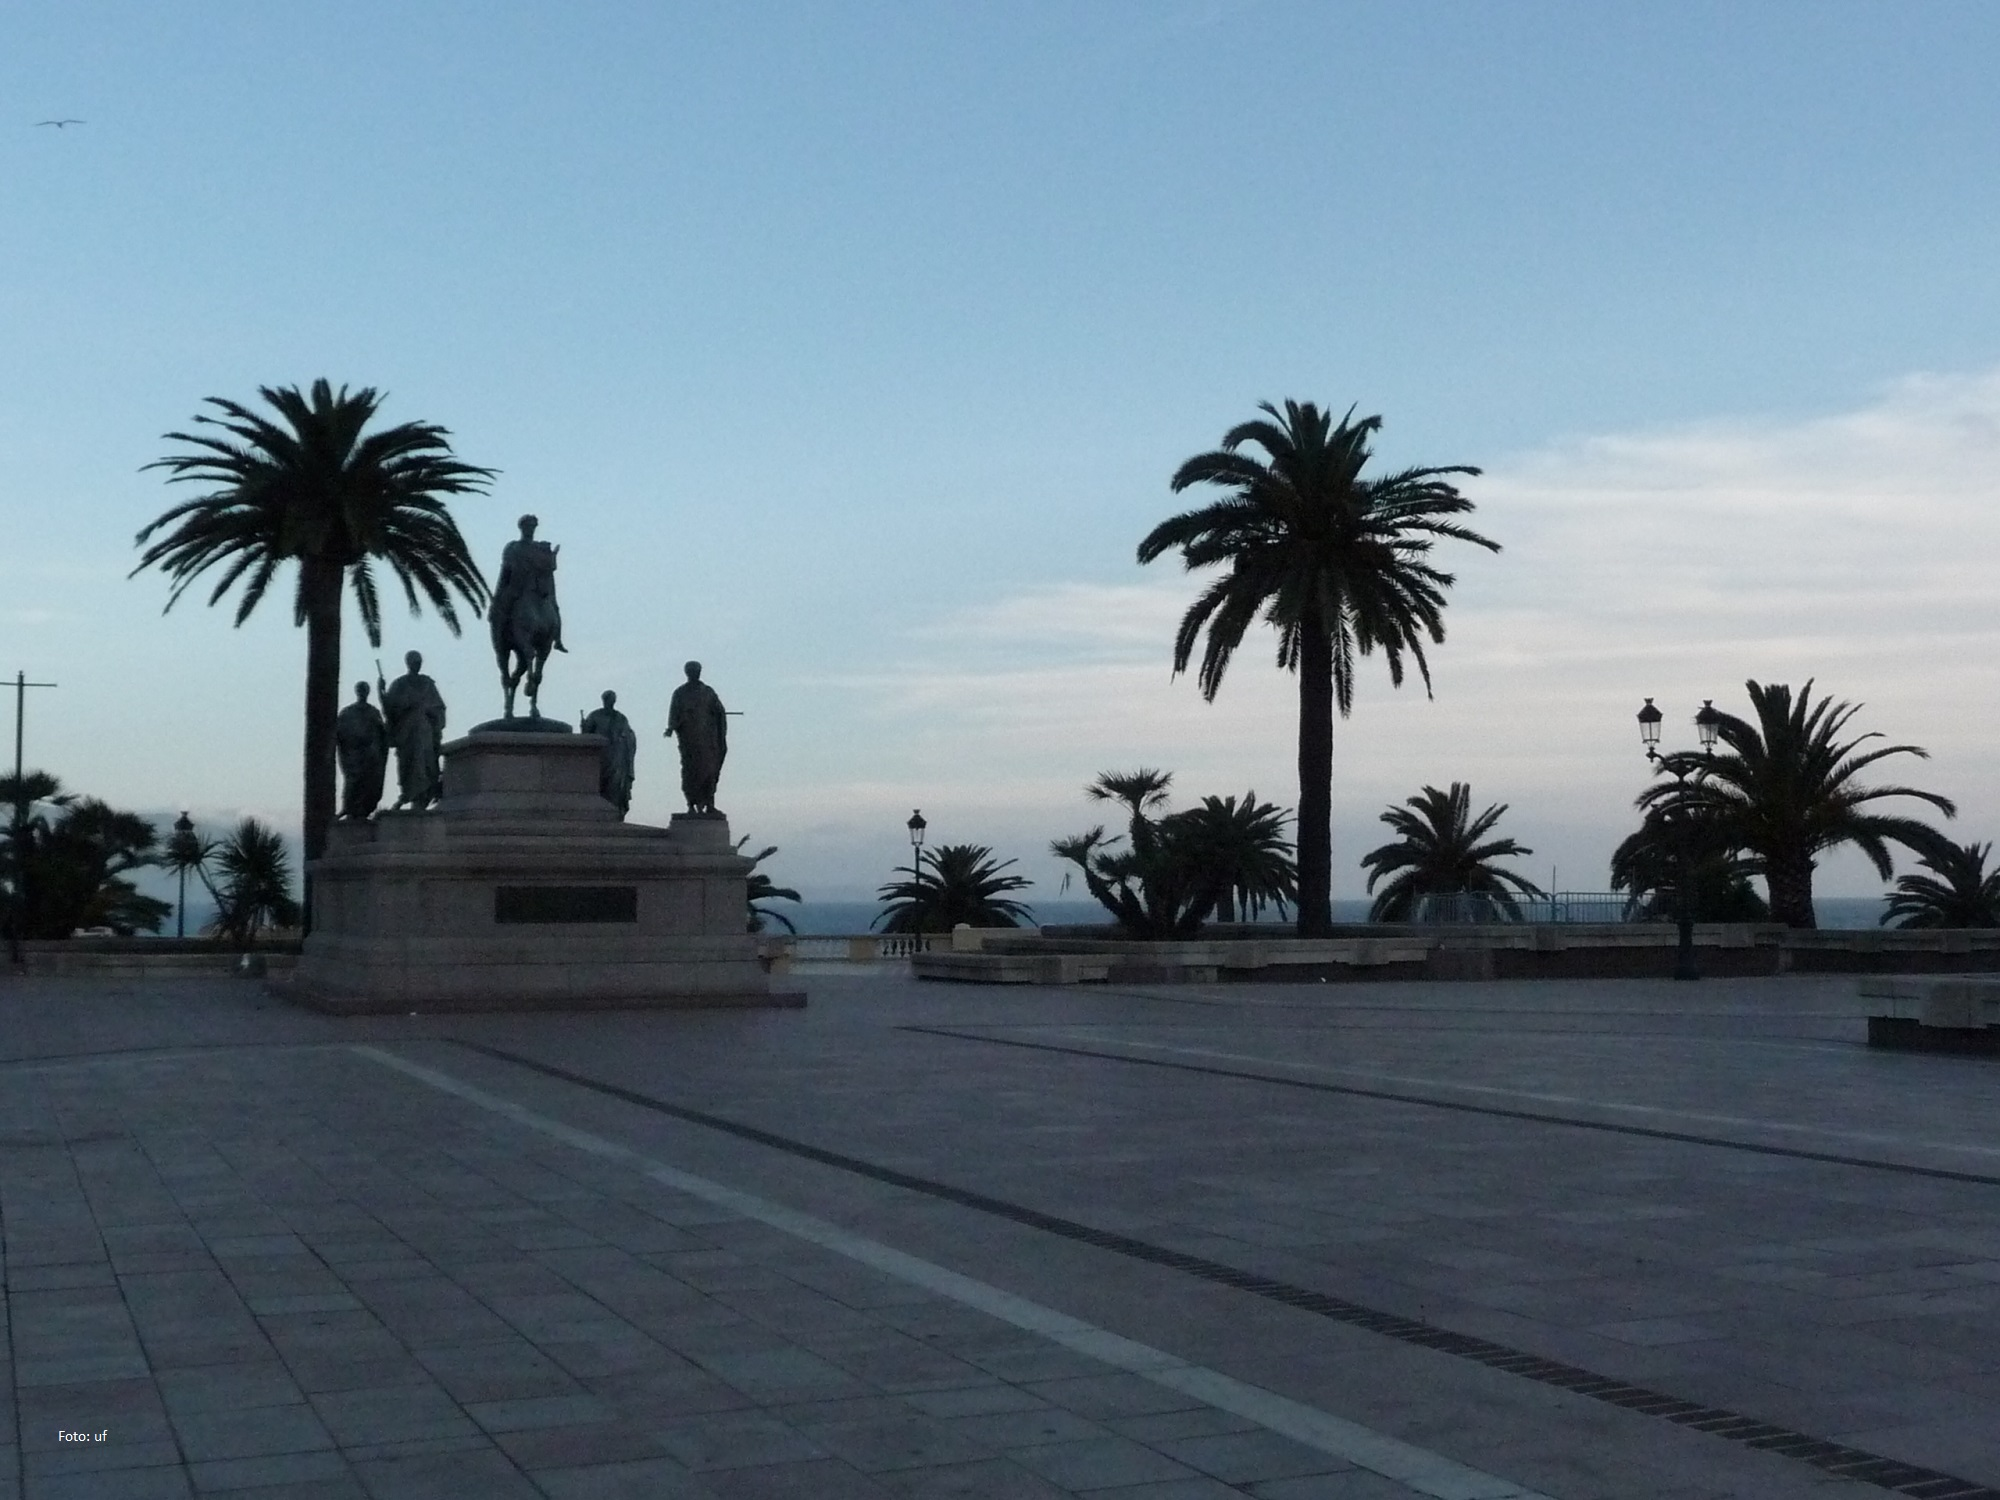 Auf dem Place Gènèral-de-Gaulle - Napoleon ist allgegenwärtig in Ajaccio